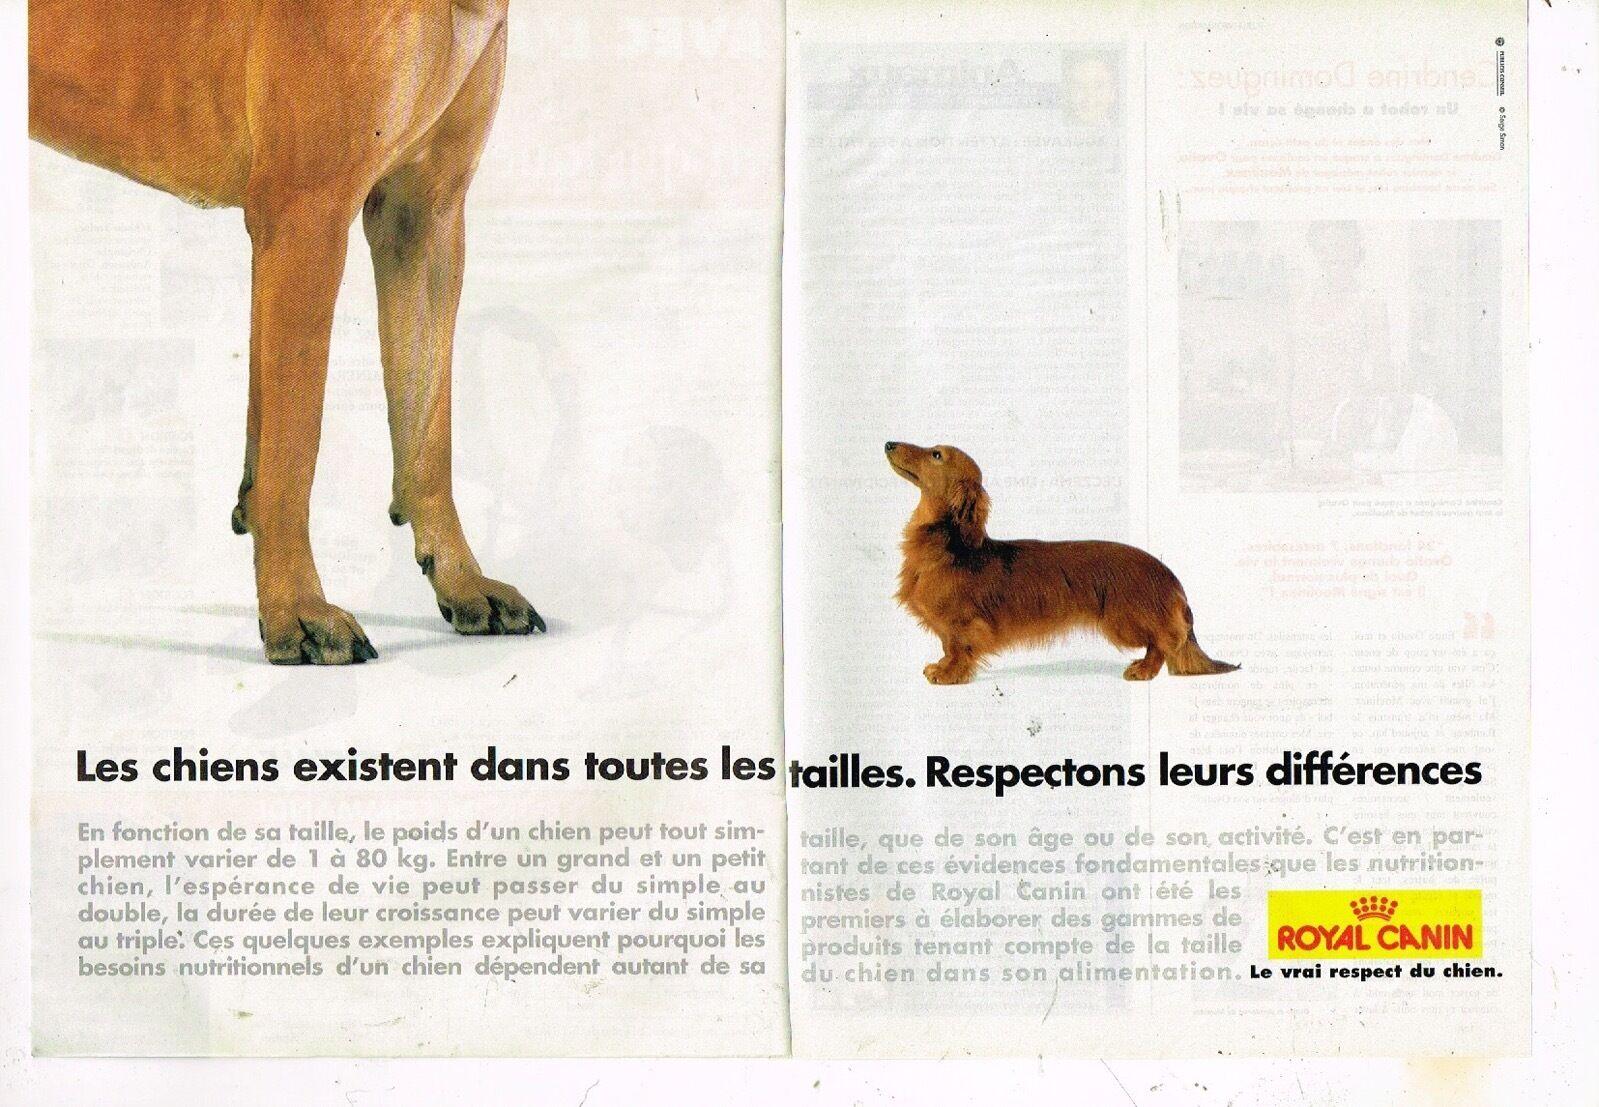 1997 Royal canin